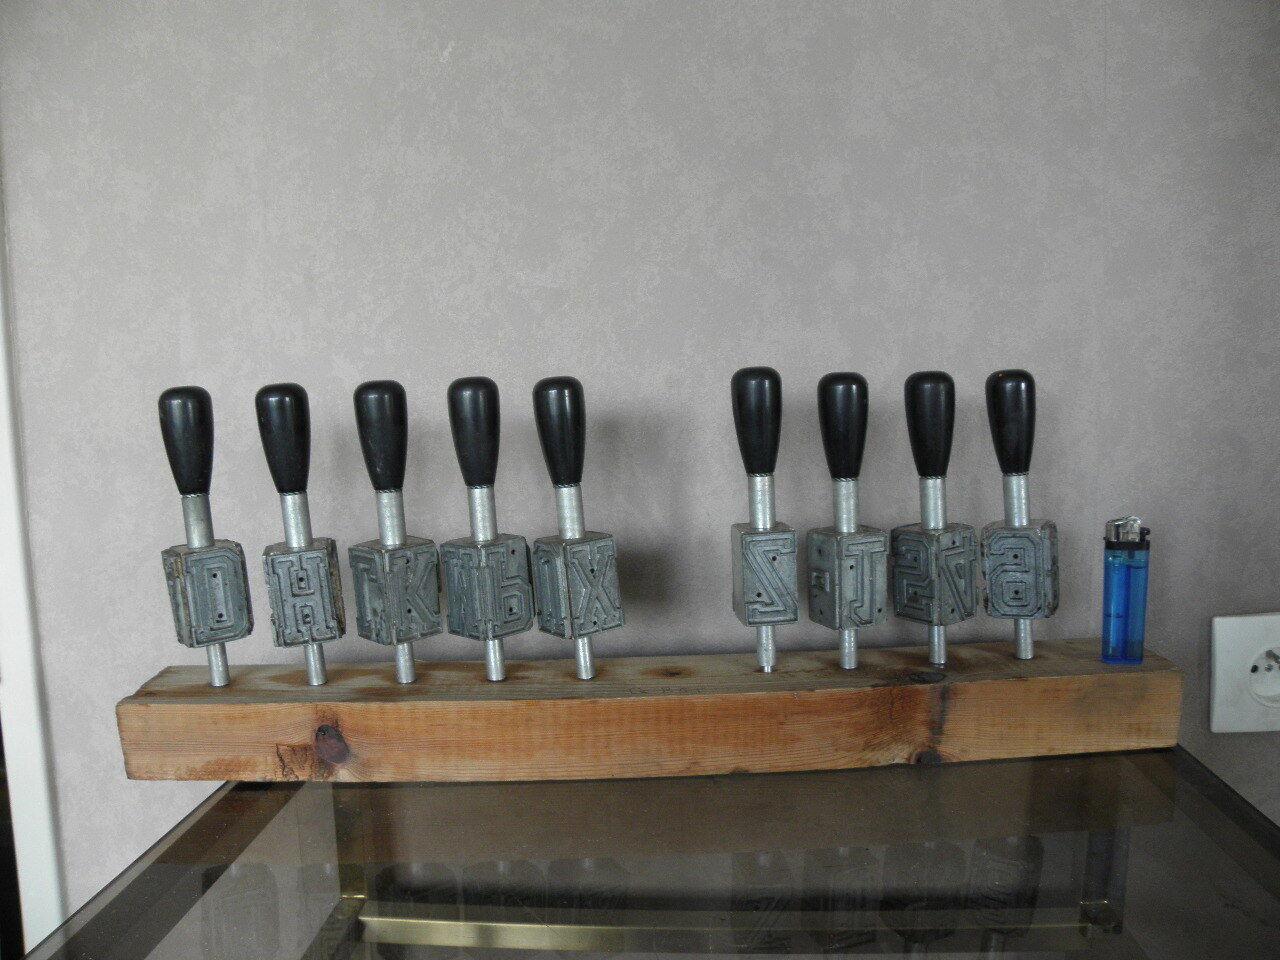 VINTAGE METAL LETTER PUNCHES. BROAD ARROW Matrix Letterpress alphabet printing